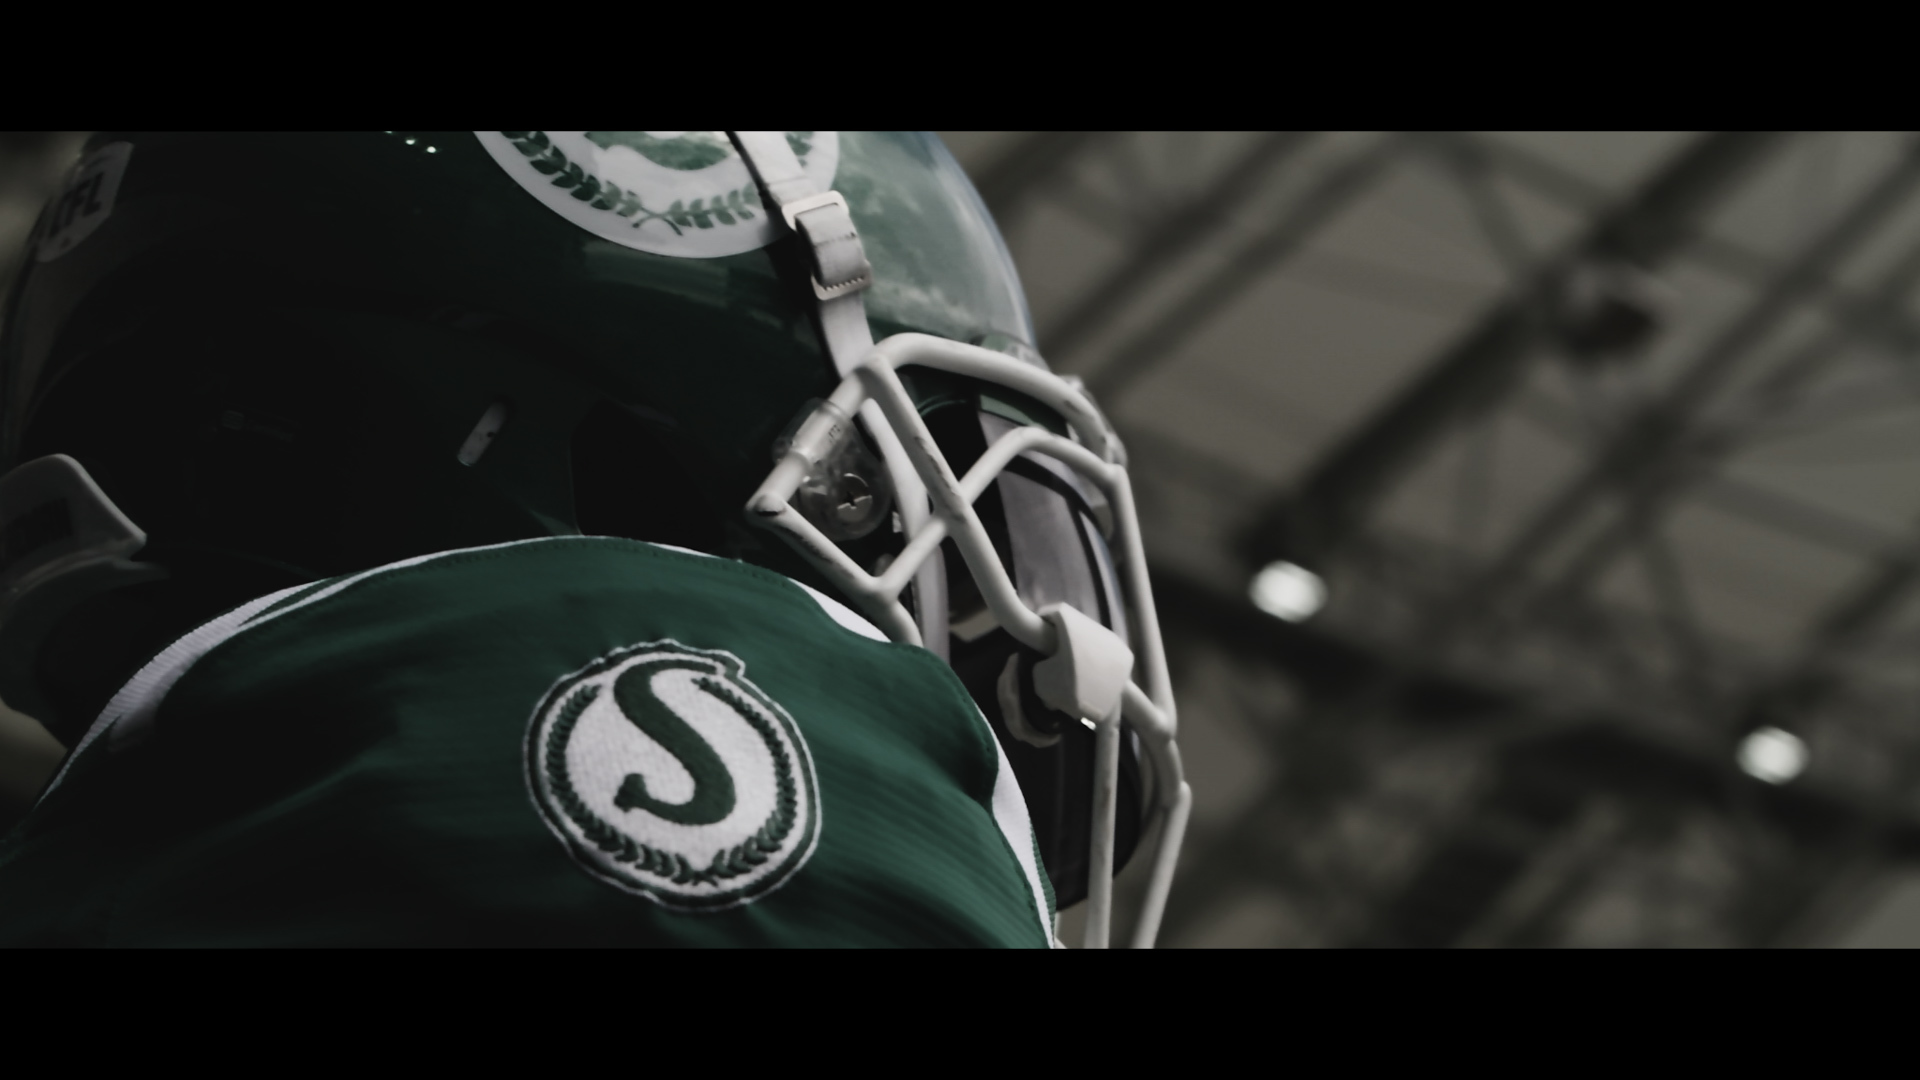 Week 5 Trailer | The Classic